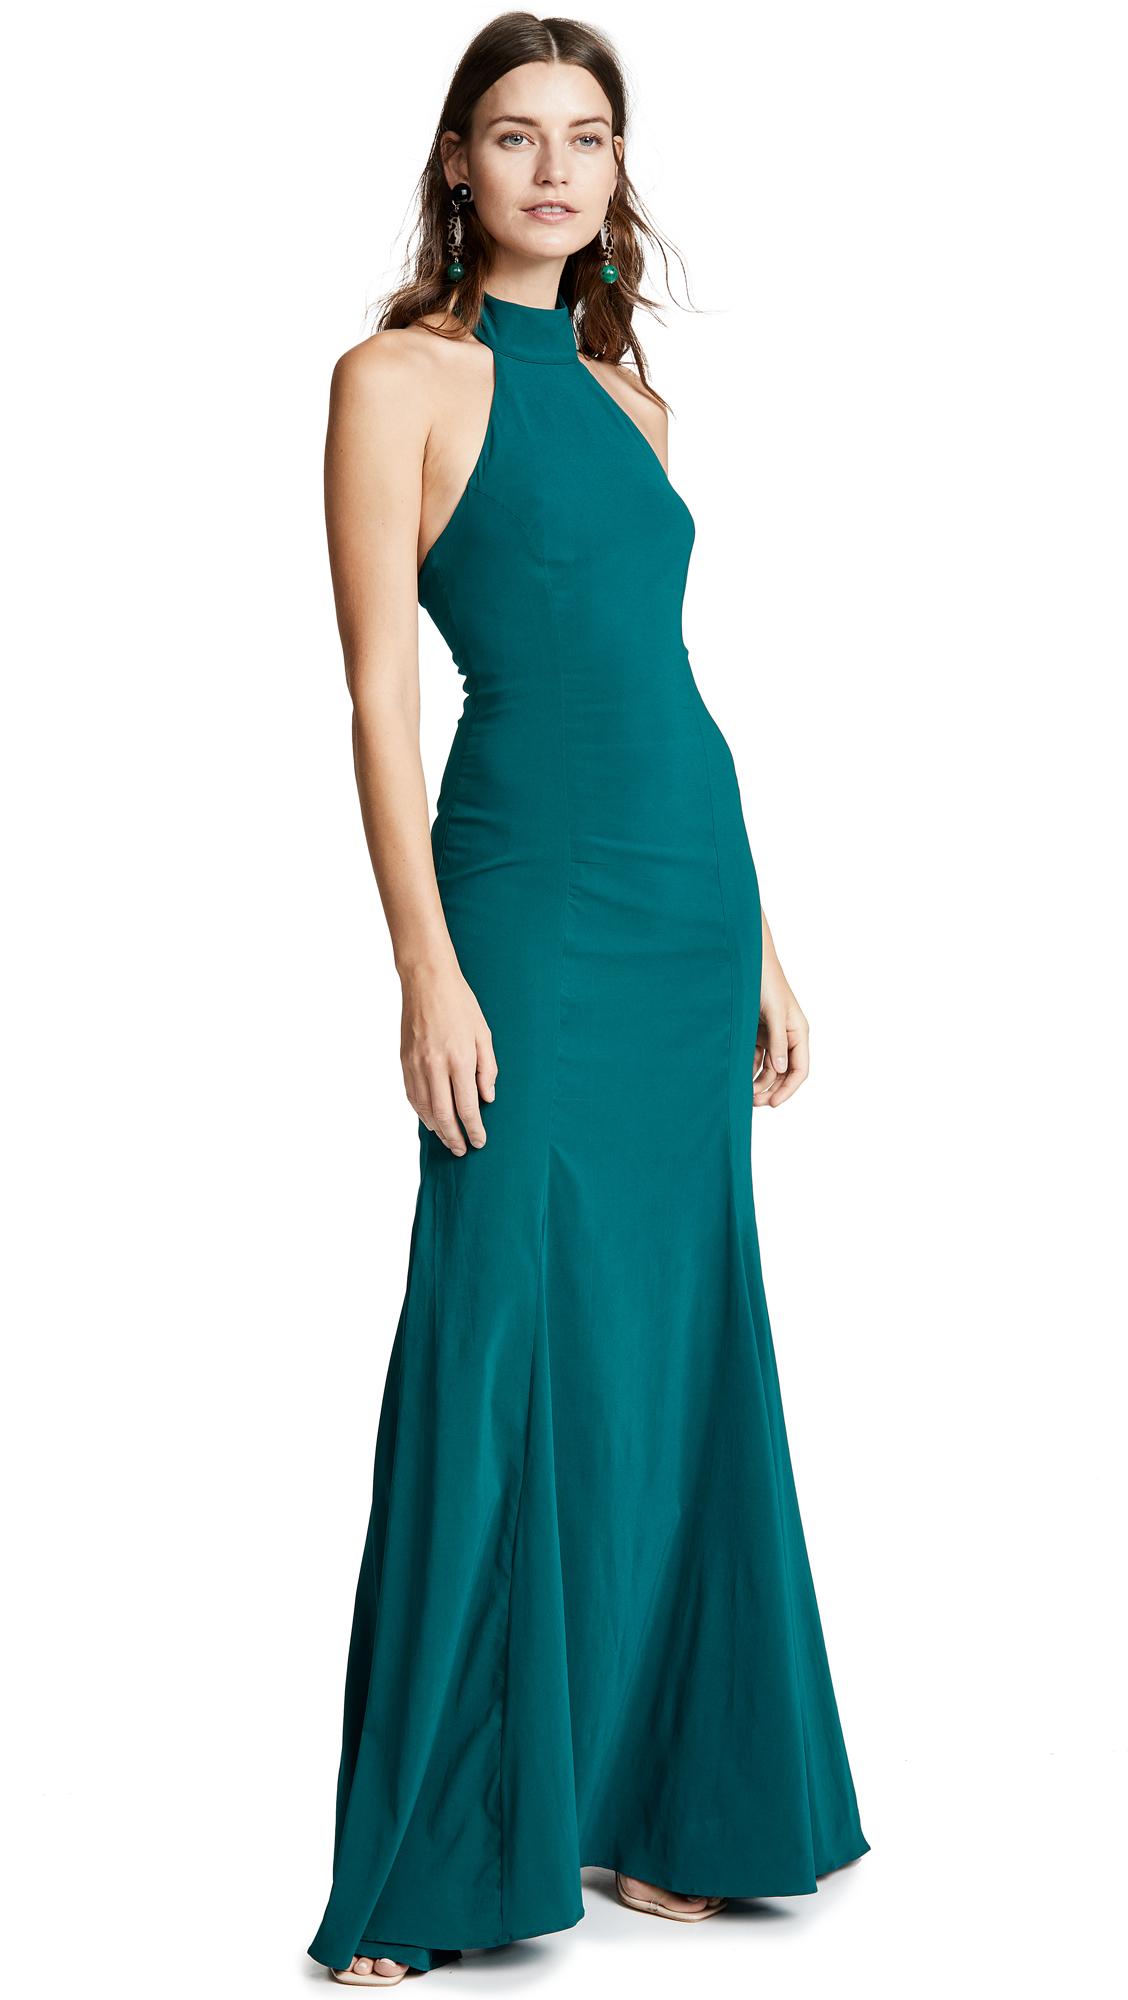 Casa Estrella Jasmine Dress - Teal